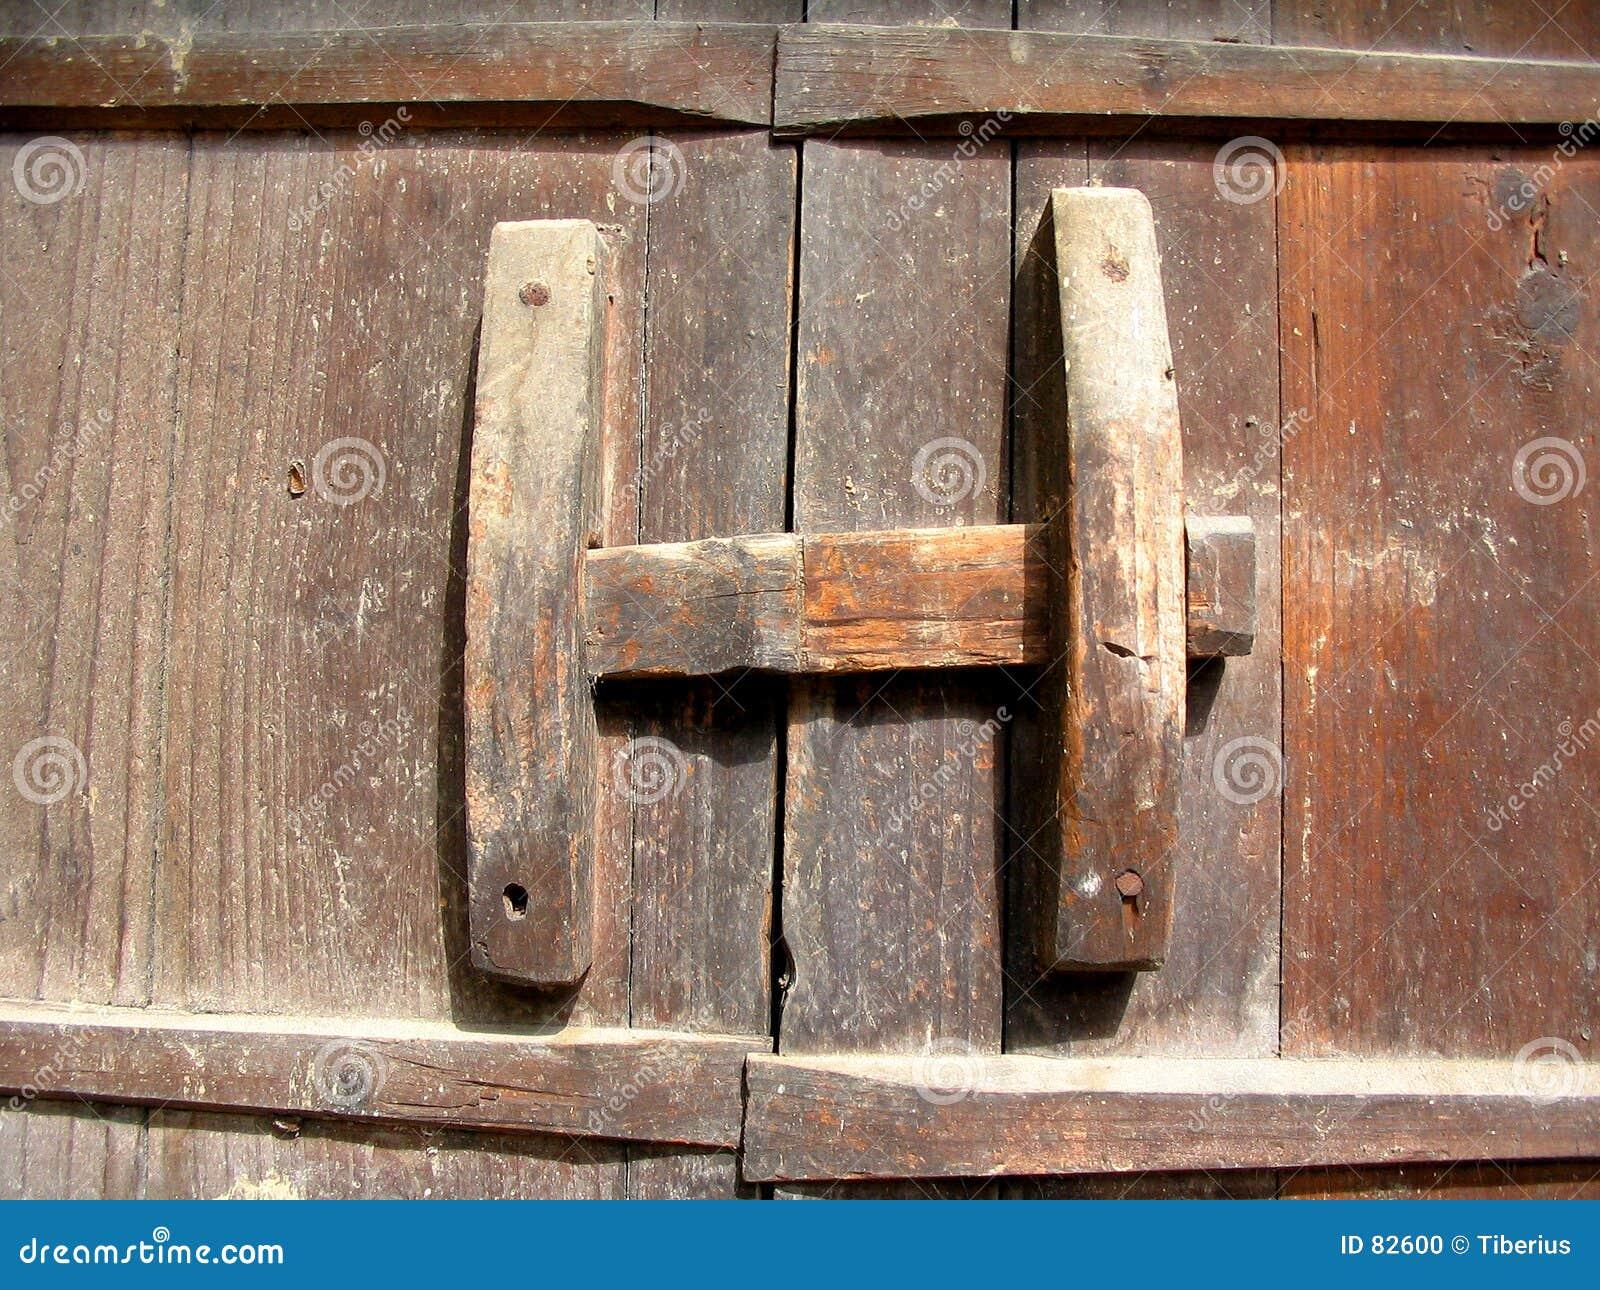 Drewno zamka